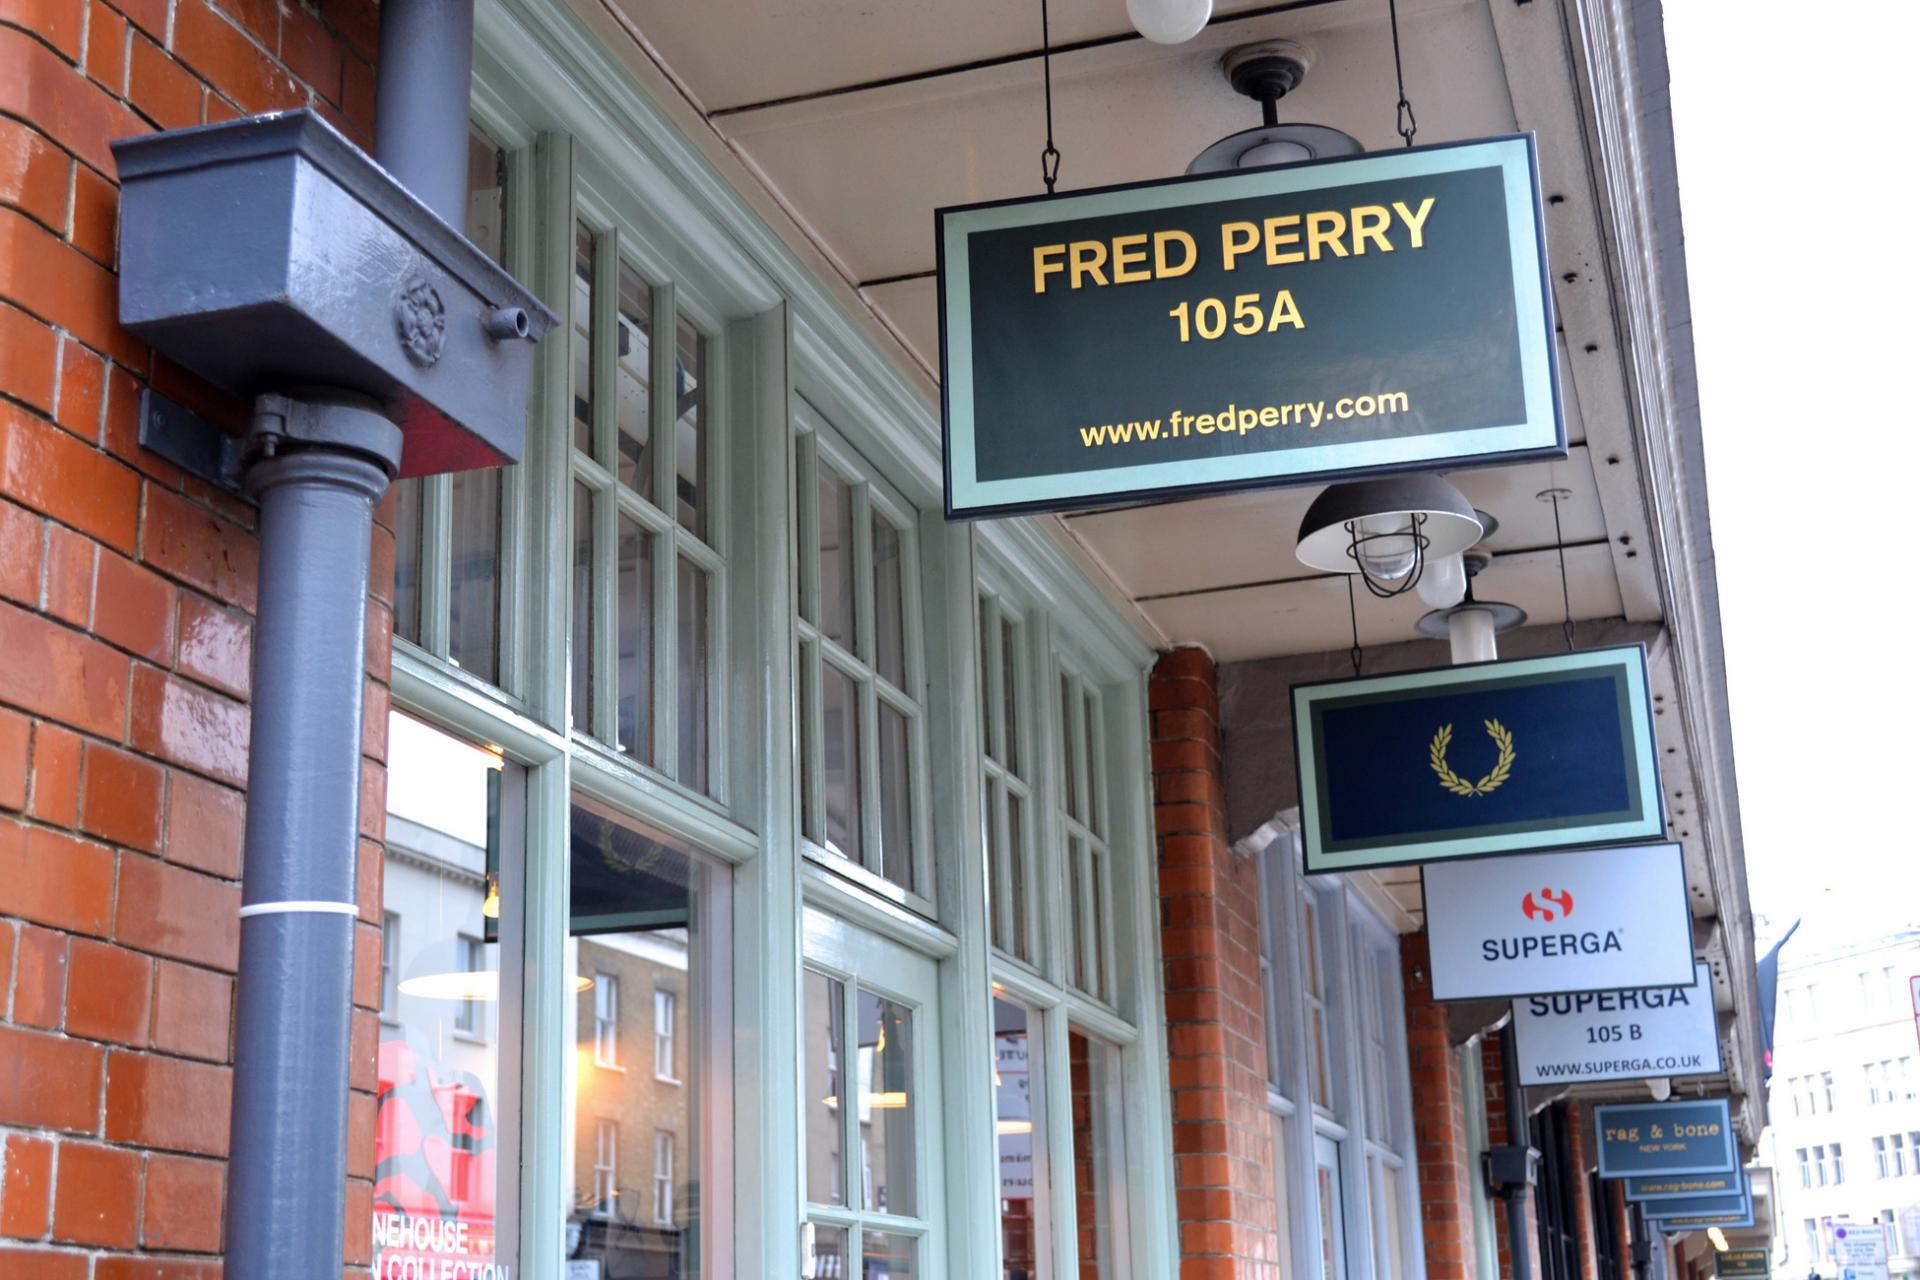 Old Spitalfields Market: Tiendas